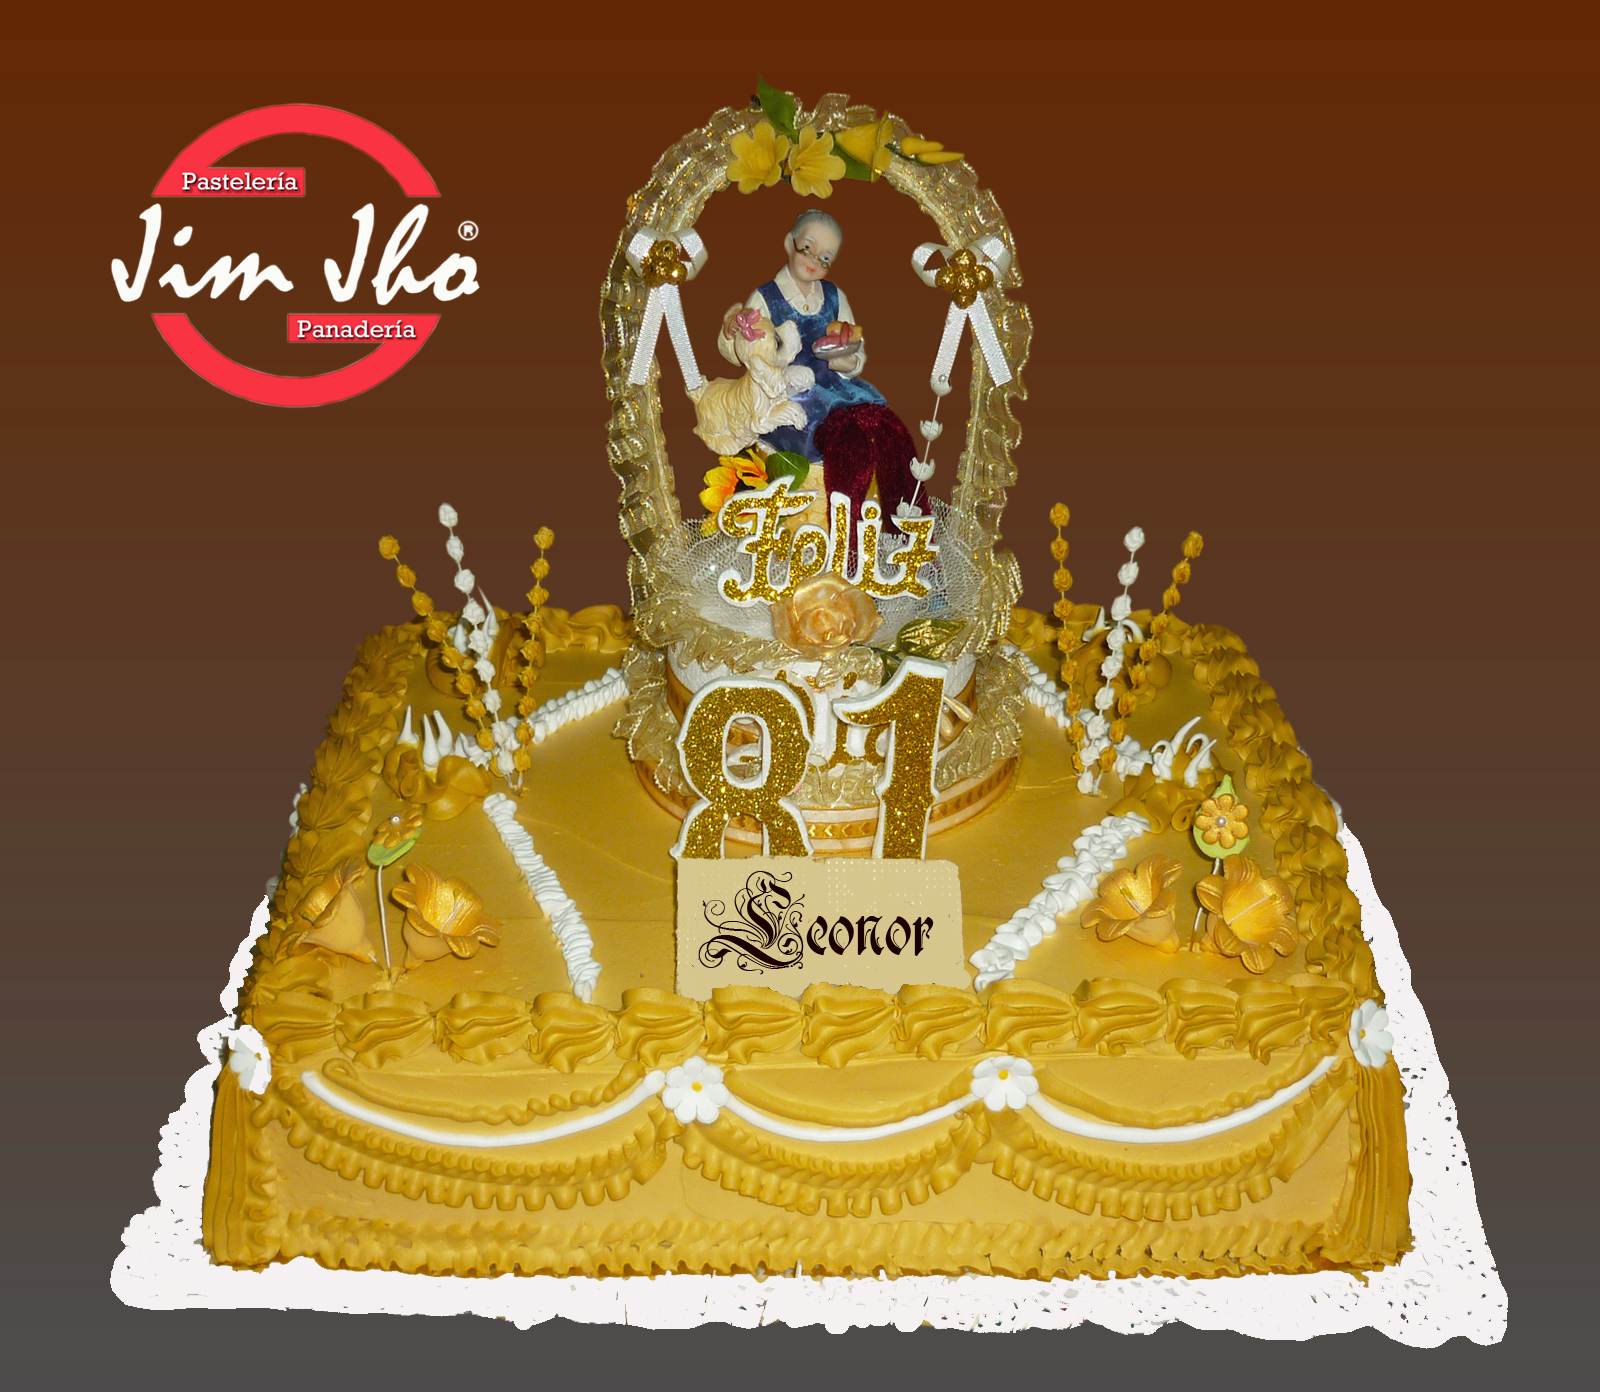 Torta 81 a os pasteler a jimjho for Decoracion 80 anos hombre